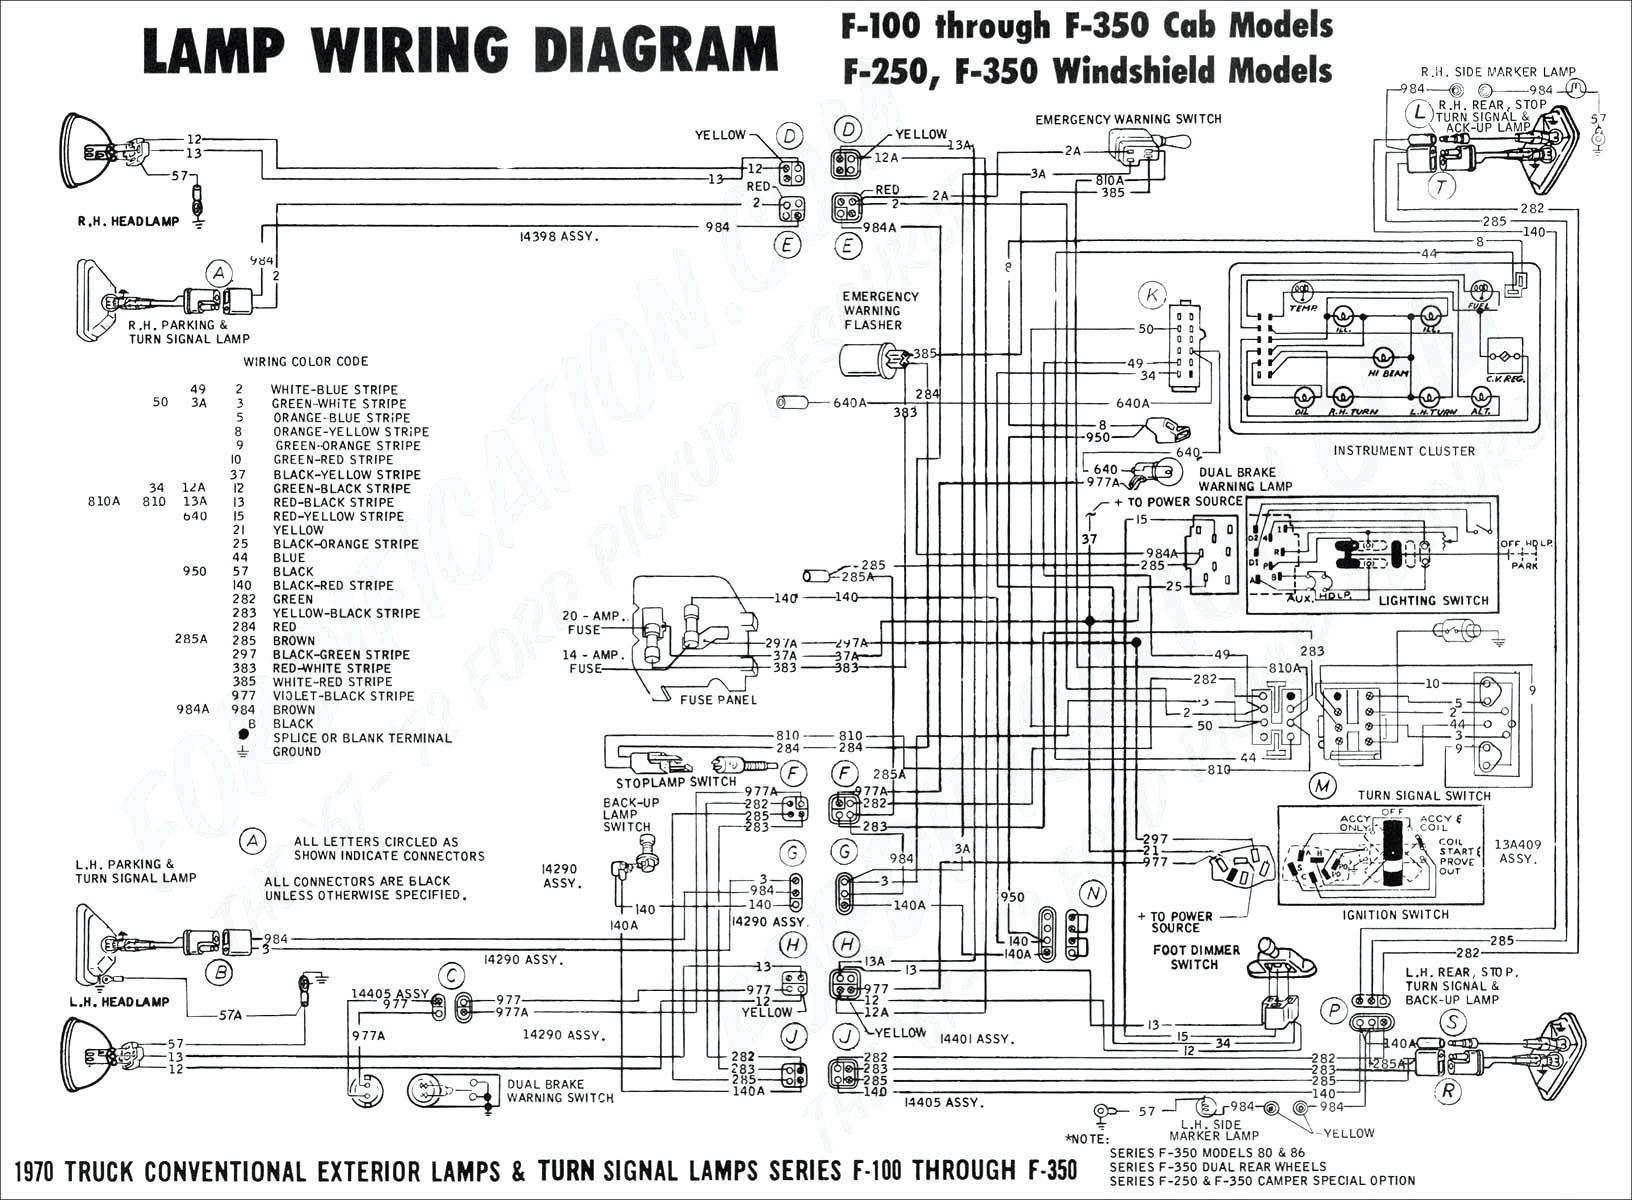 Headlight Switch Wiring Diagram Chevy Truck Wiring Diagram for Gm Light Switch New Wiring Diagram for Light with Of Headlight Switch Wiring Diagram Chevy Truck